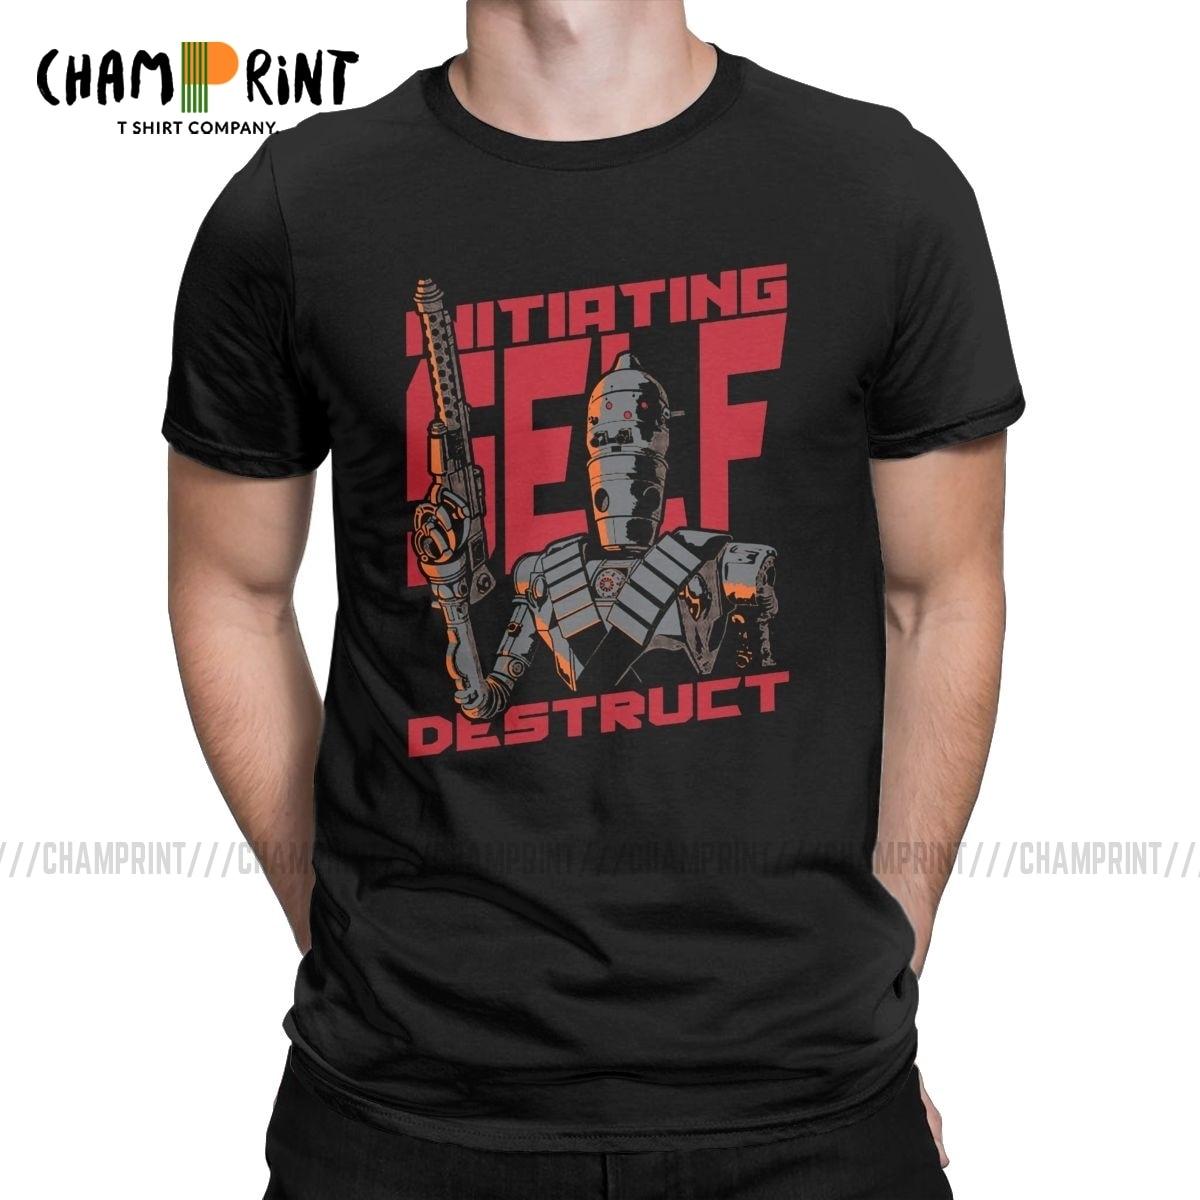 Hipster auto destructivo camiseta para hombres cuello redondo 100% algodón camiseta Mandalorian Star Wars camisetas de manga corta Camisetas de talla grande